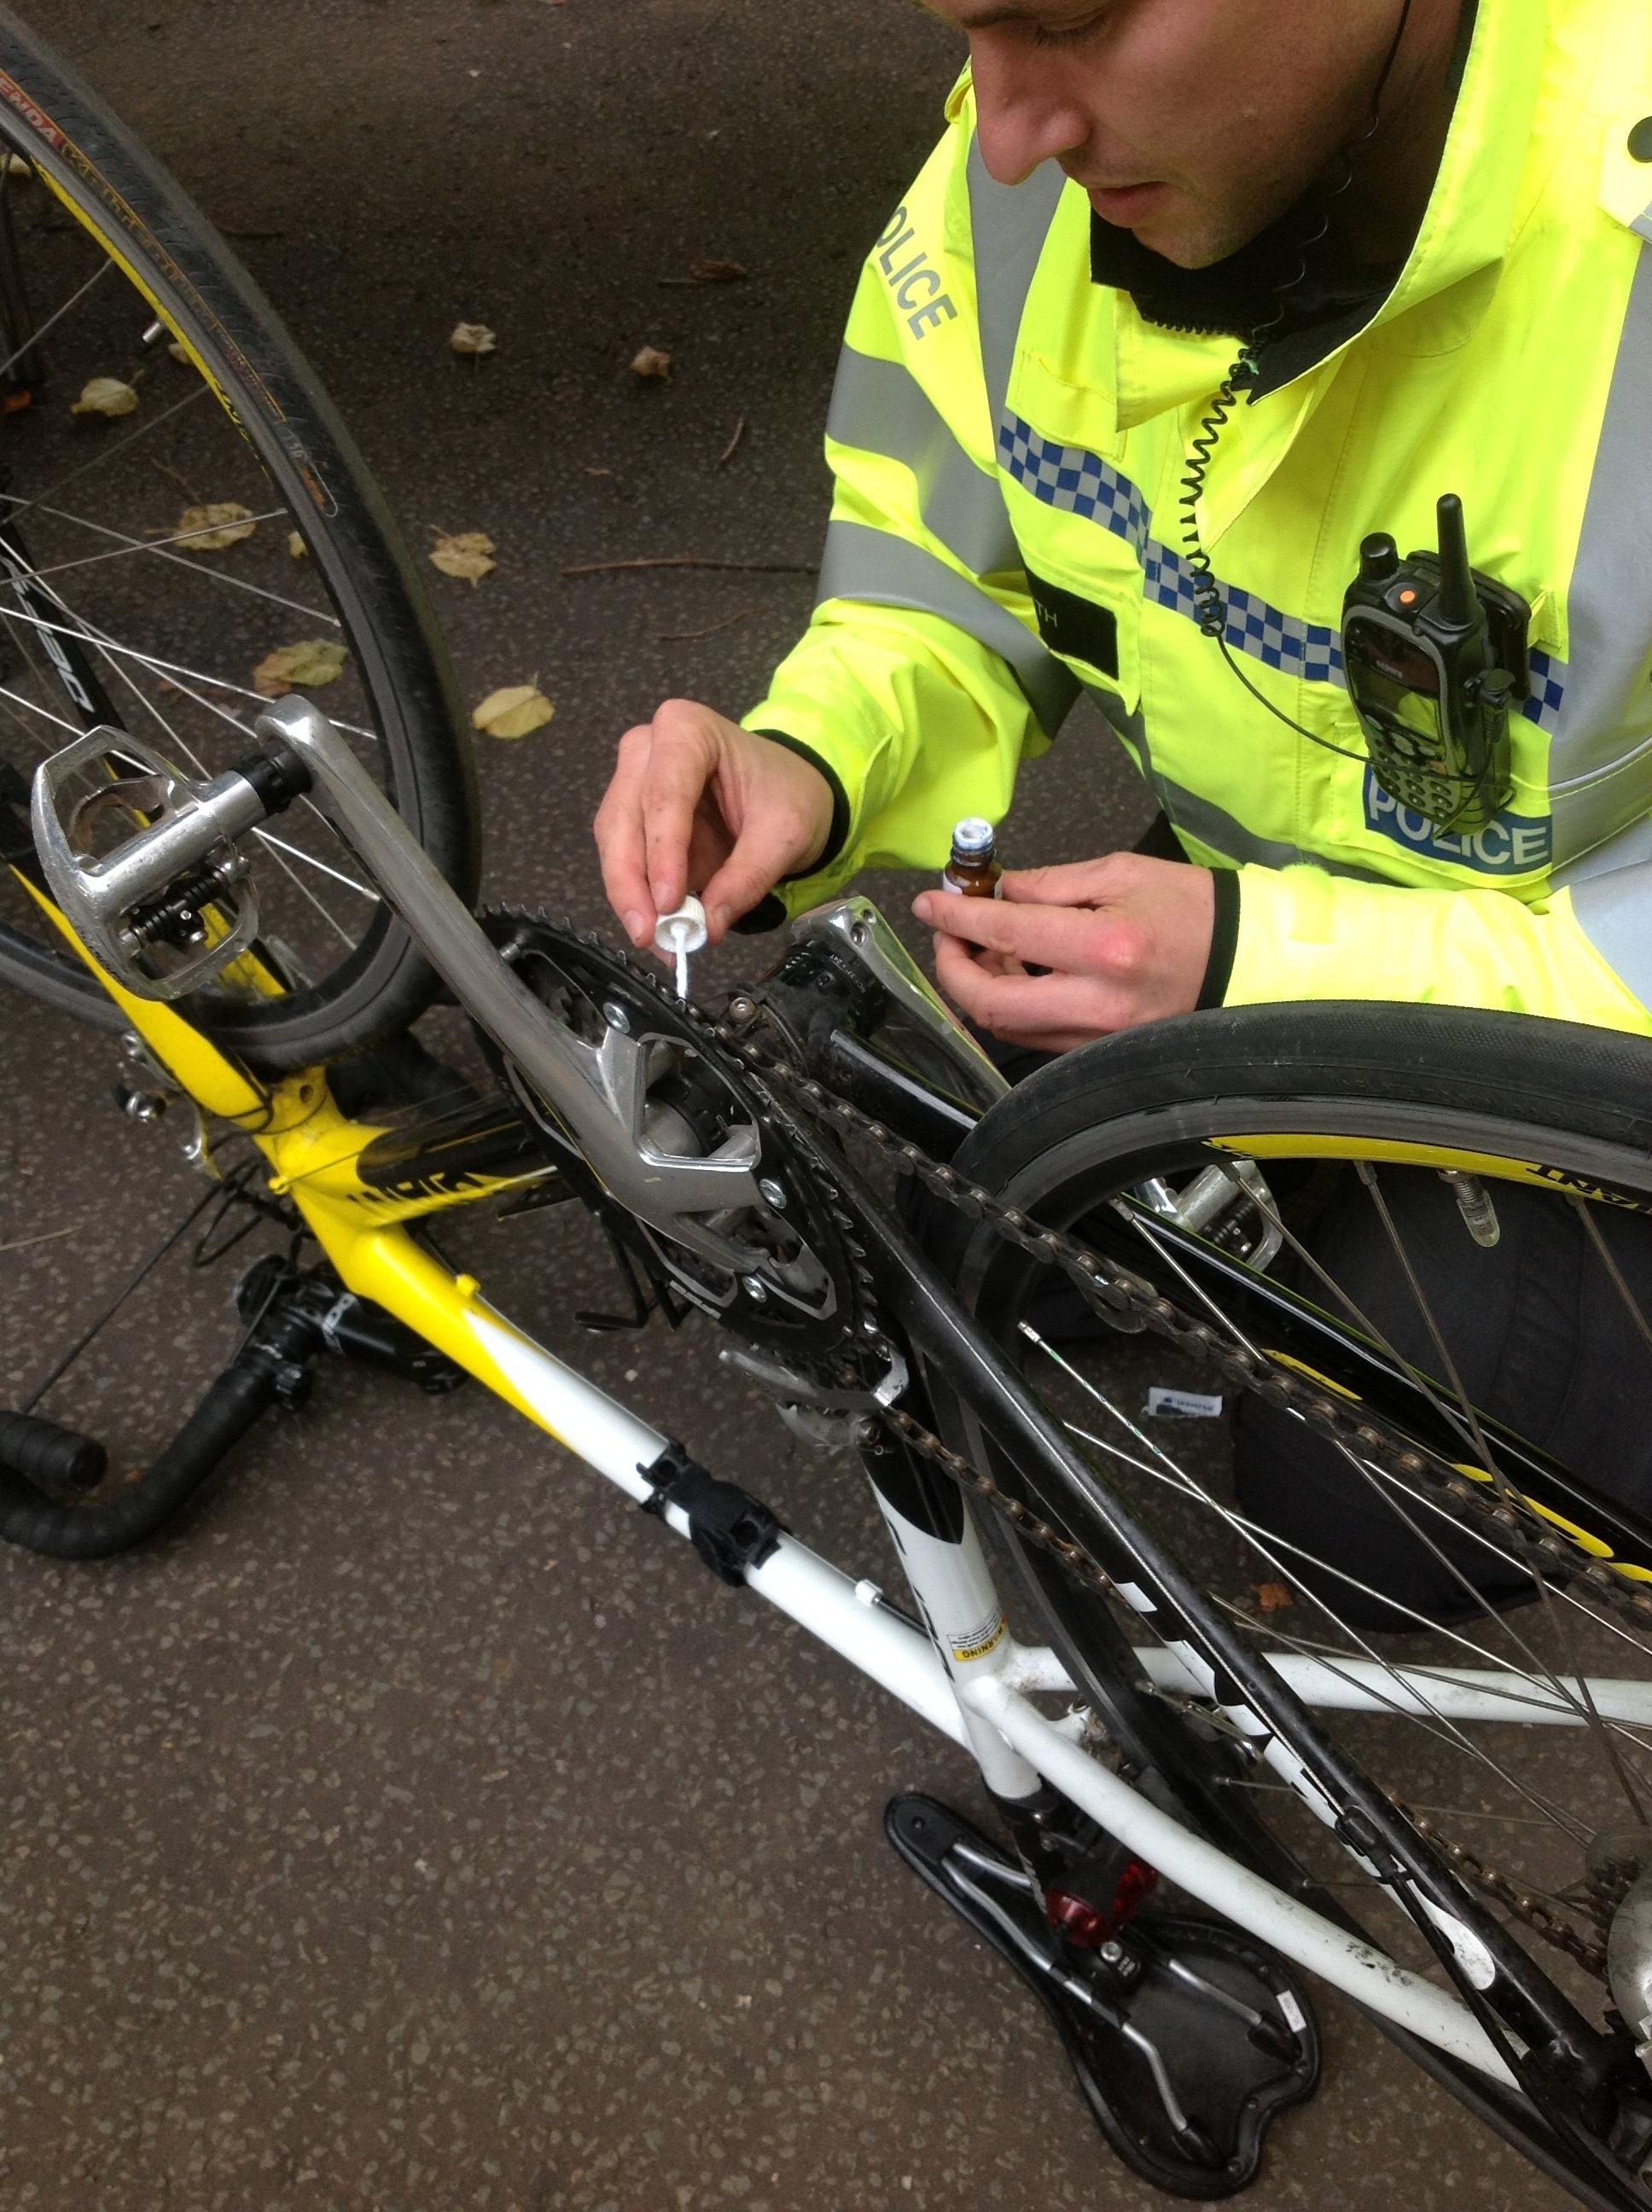 File:Day 285 - West Midlands Police - Bicycle frame marking ...